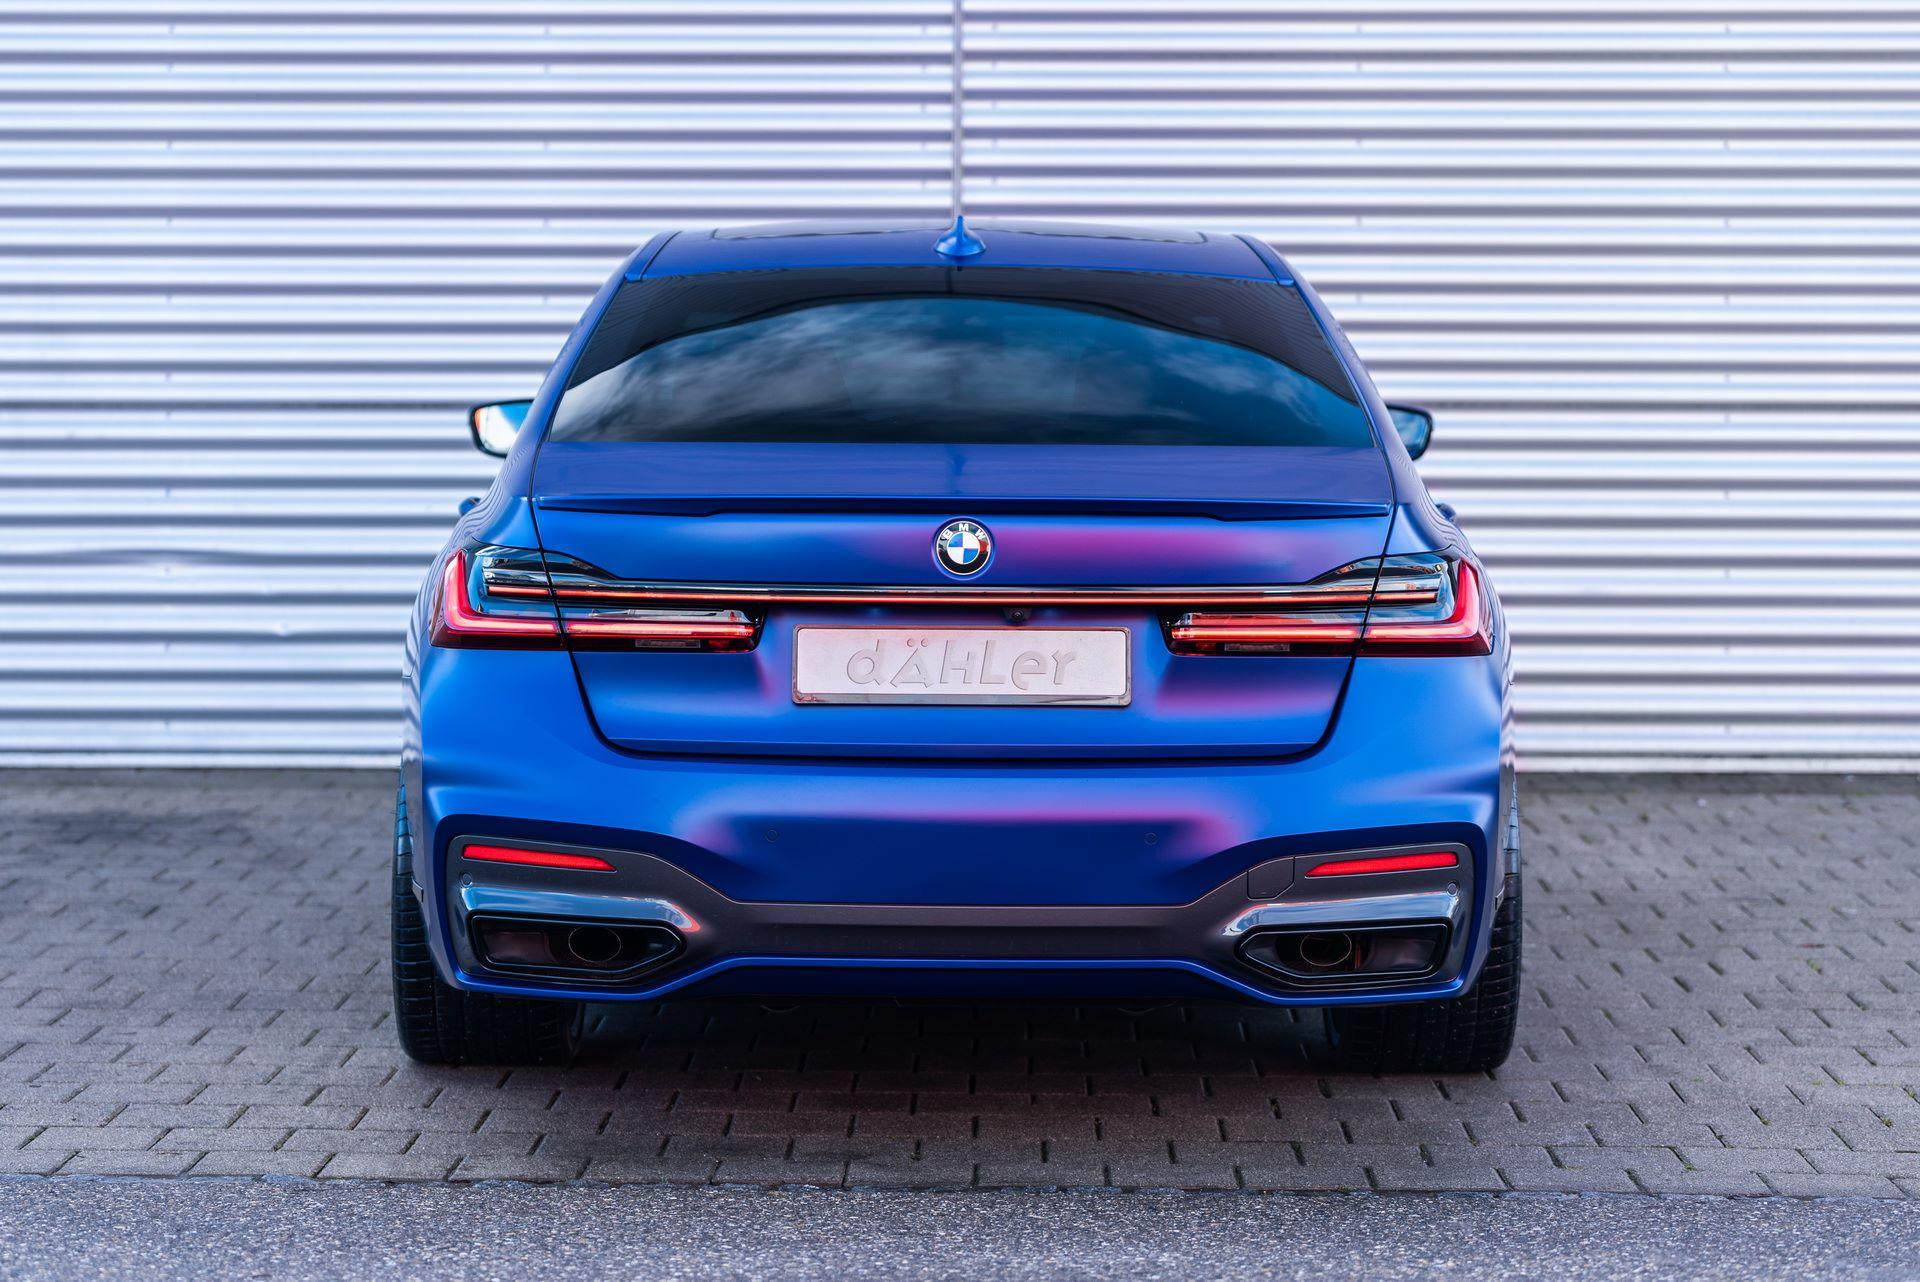 BMW-745Le-xDrive-by-Dahler-4